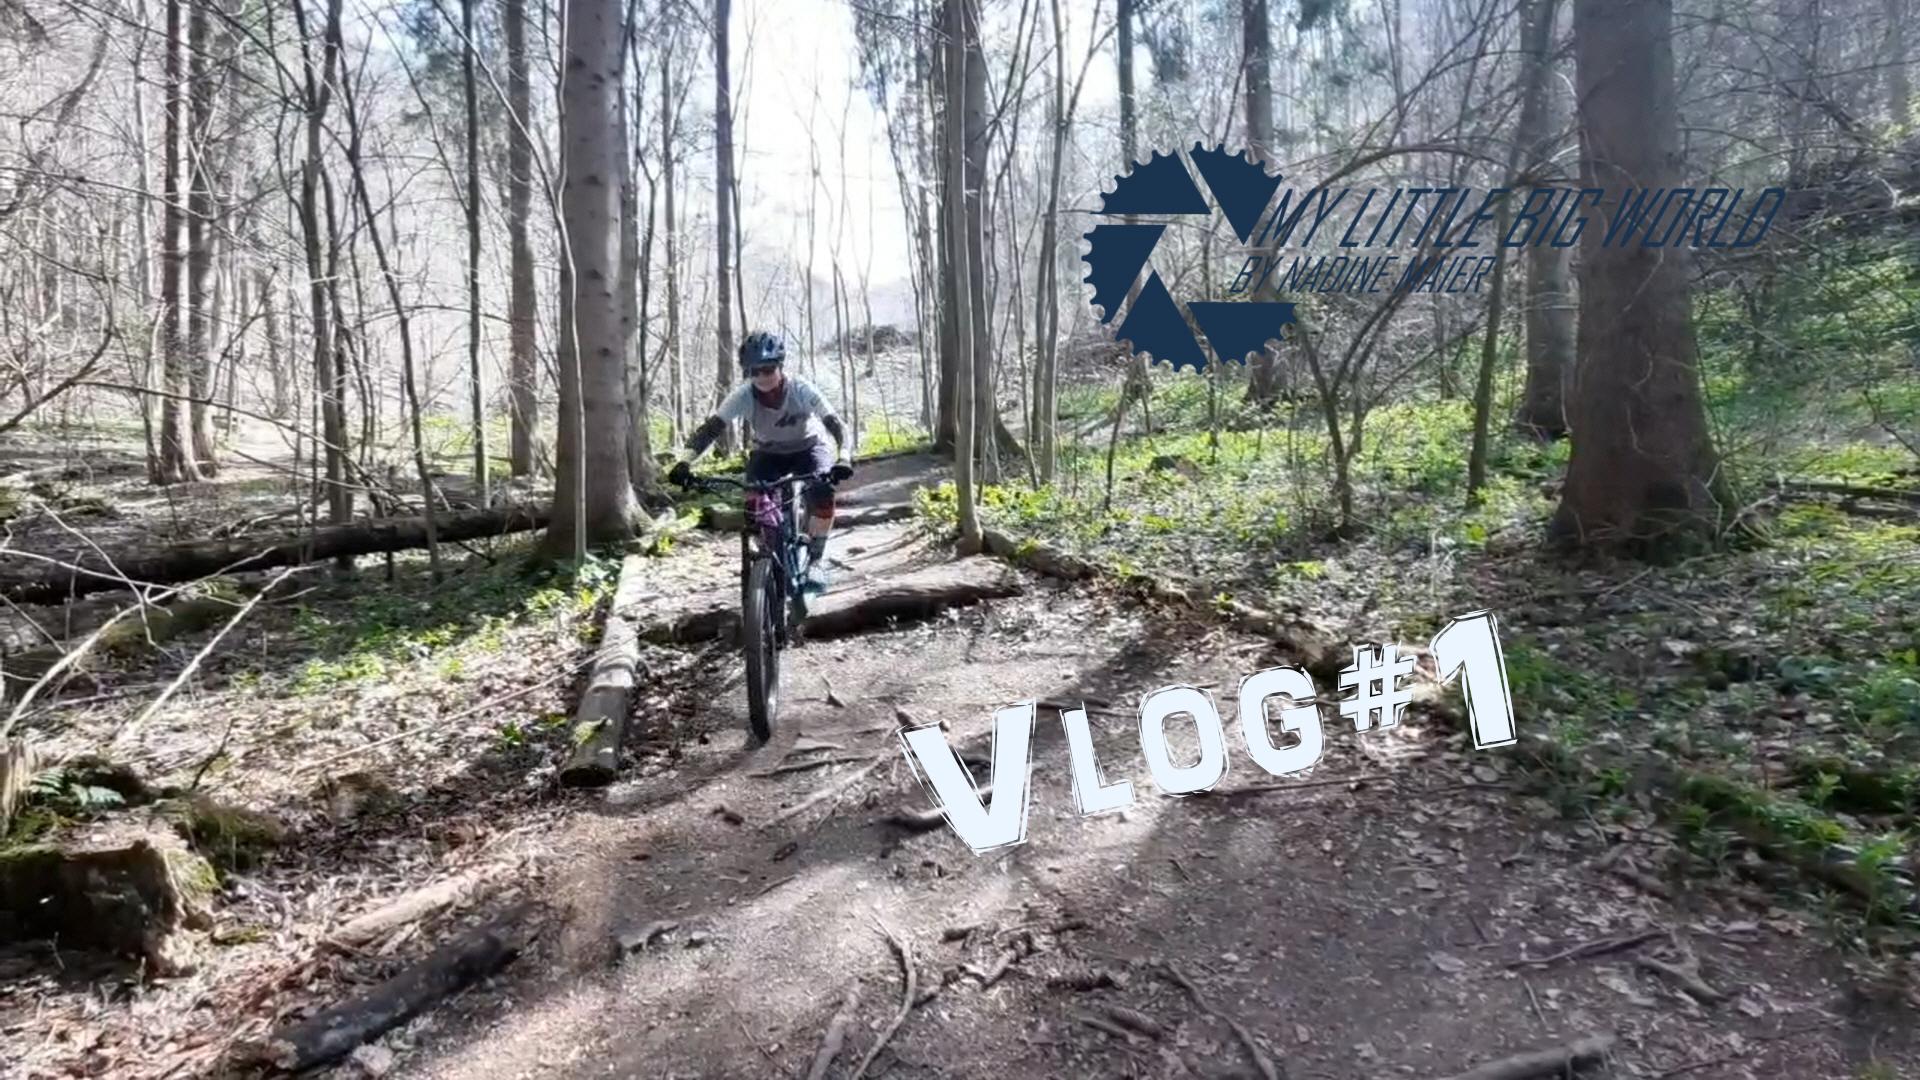 Mami-Bike Alltag: Vlog#1